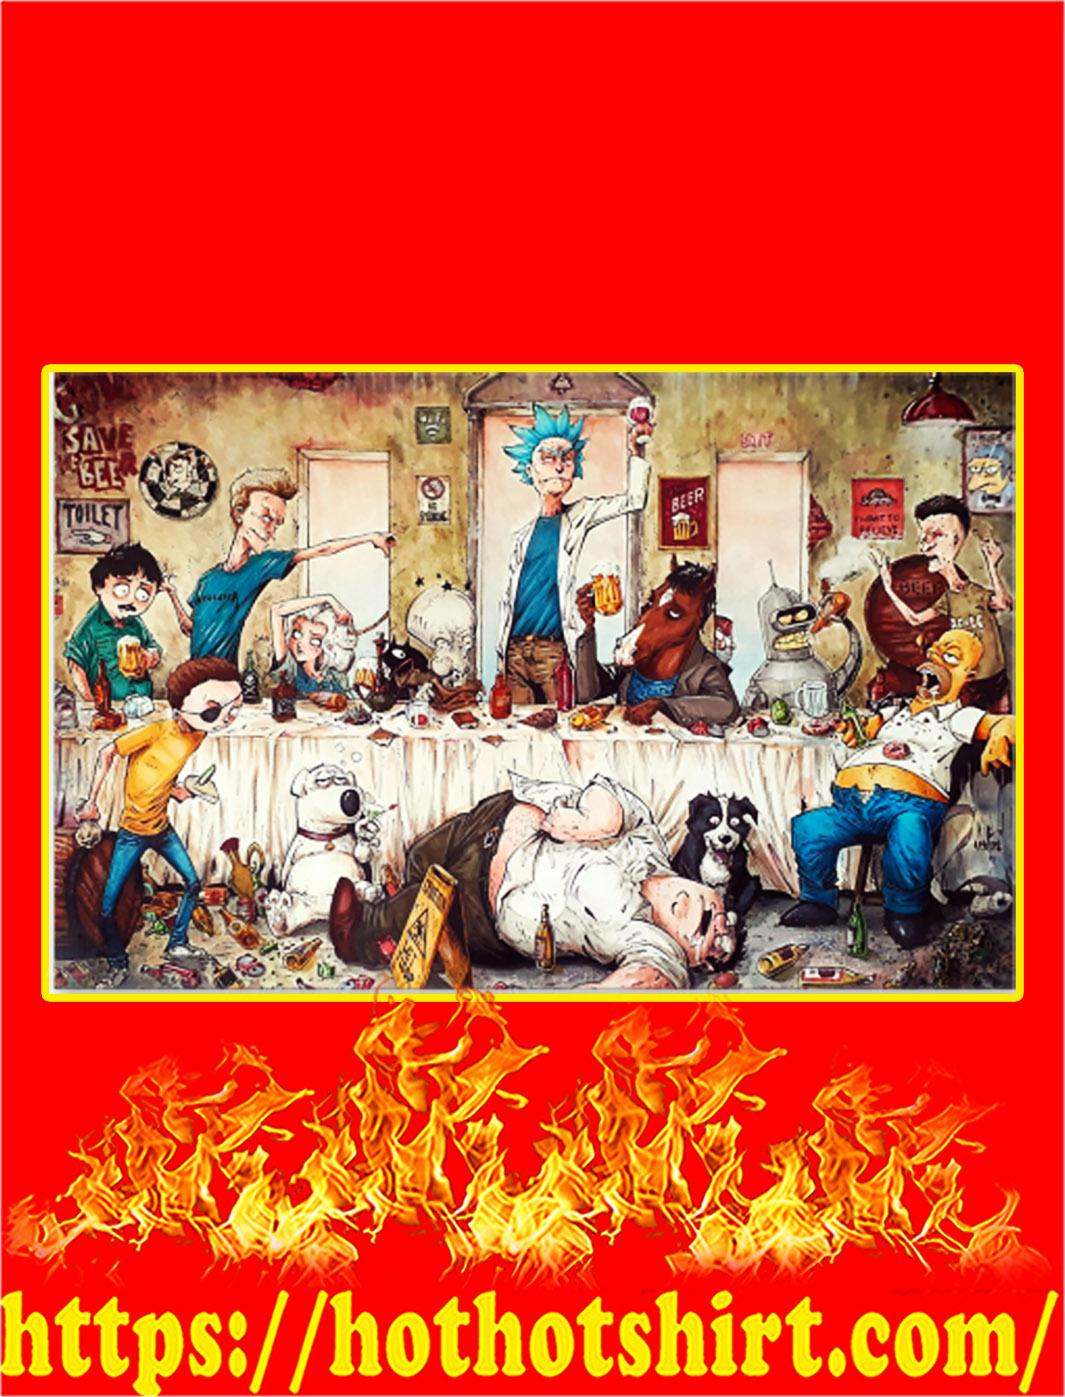 Adult cartoons art work by marcelo ventura poster - A3